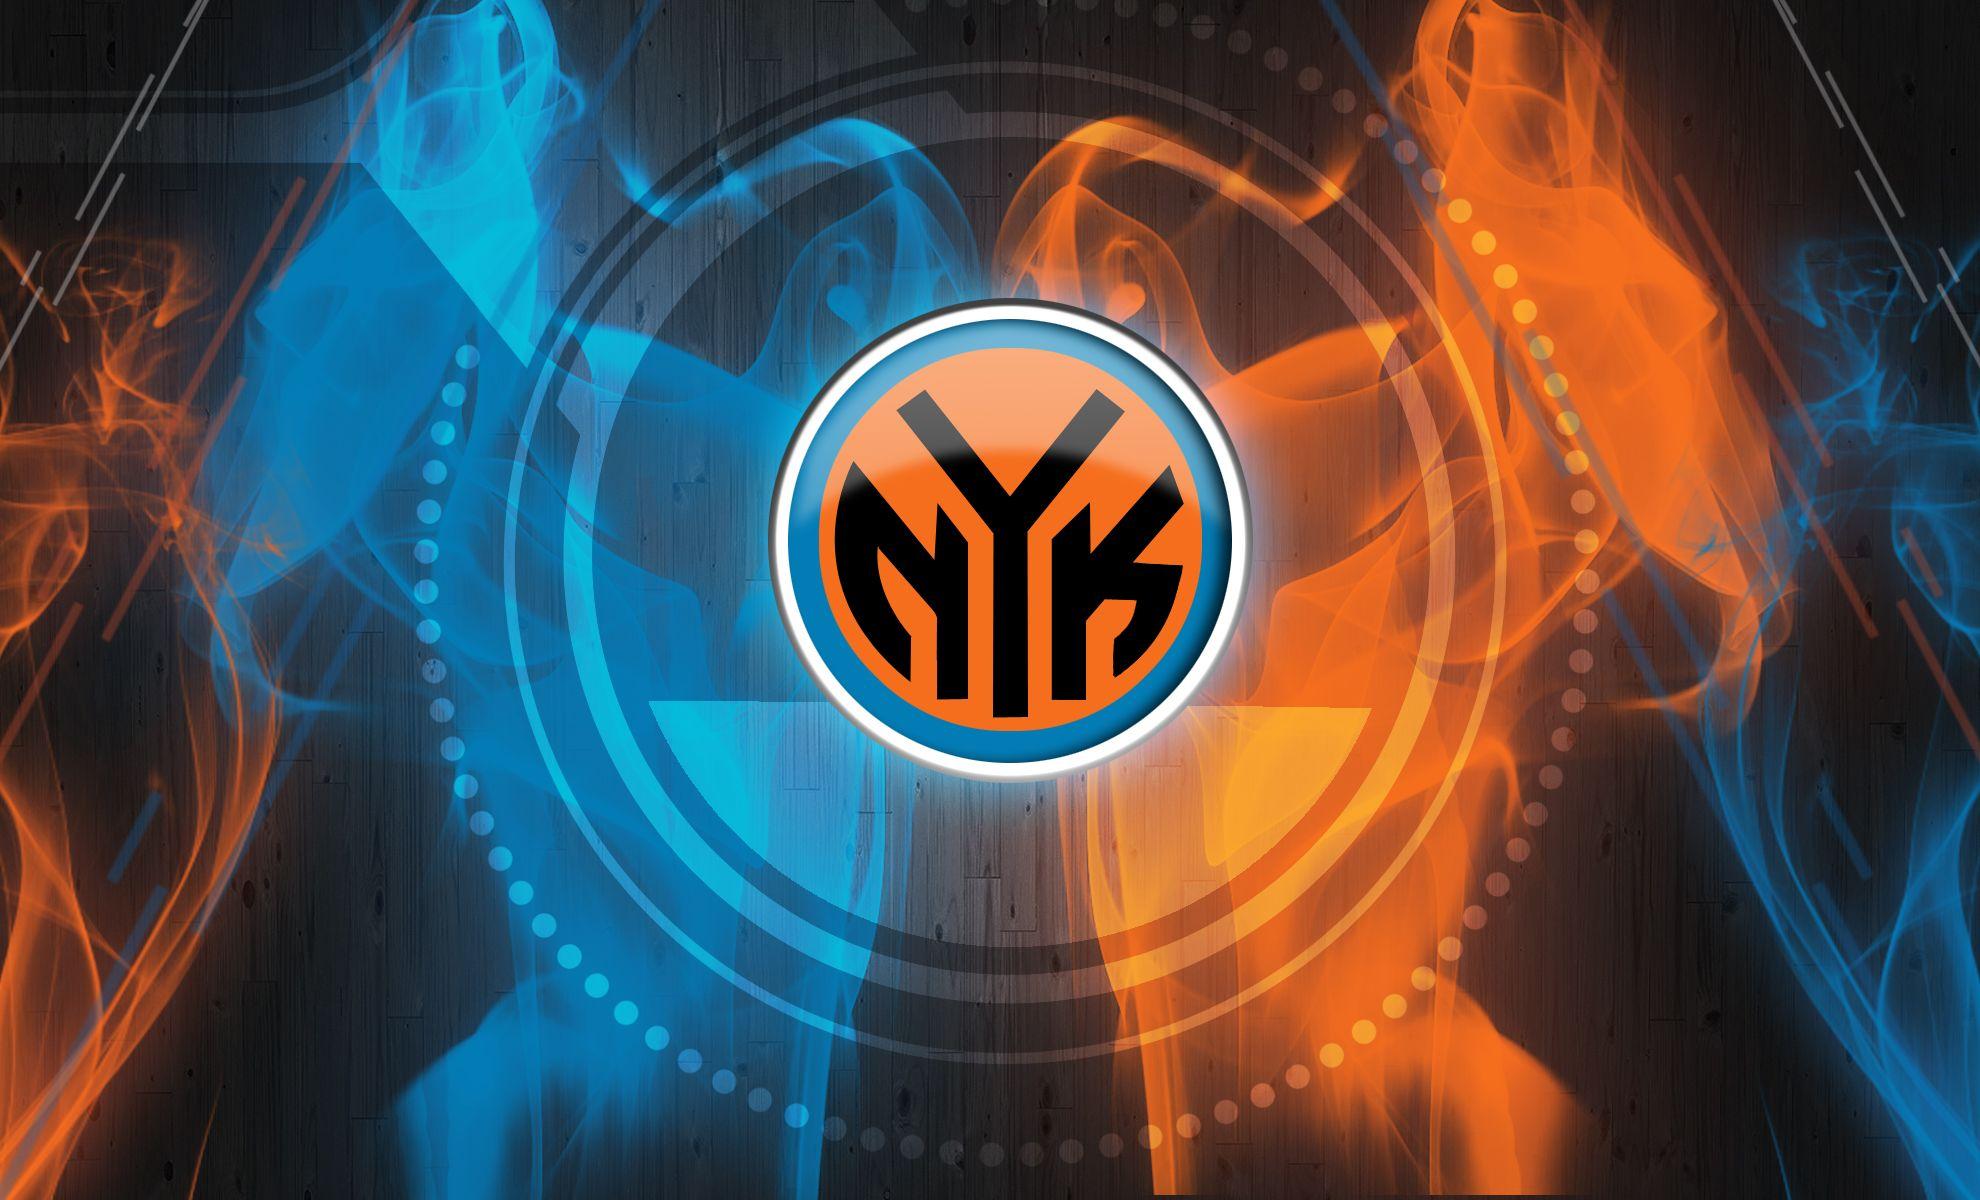 New York Knicks New York Knicks Logo New York Knicks Nba